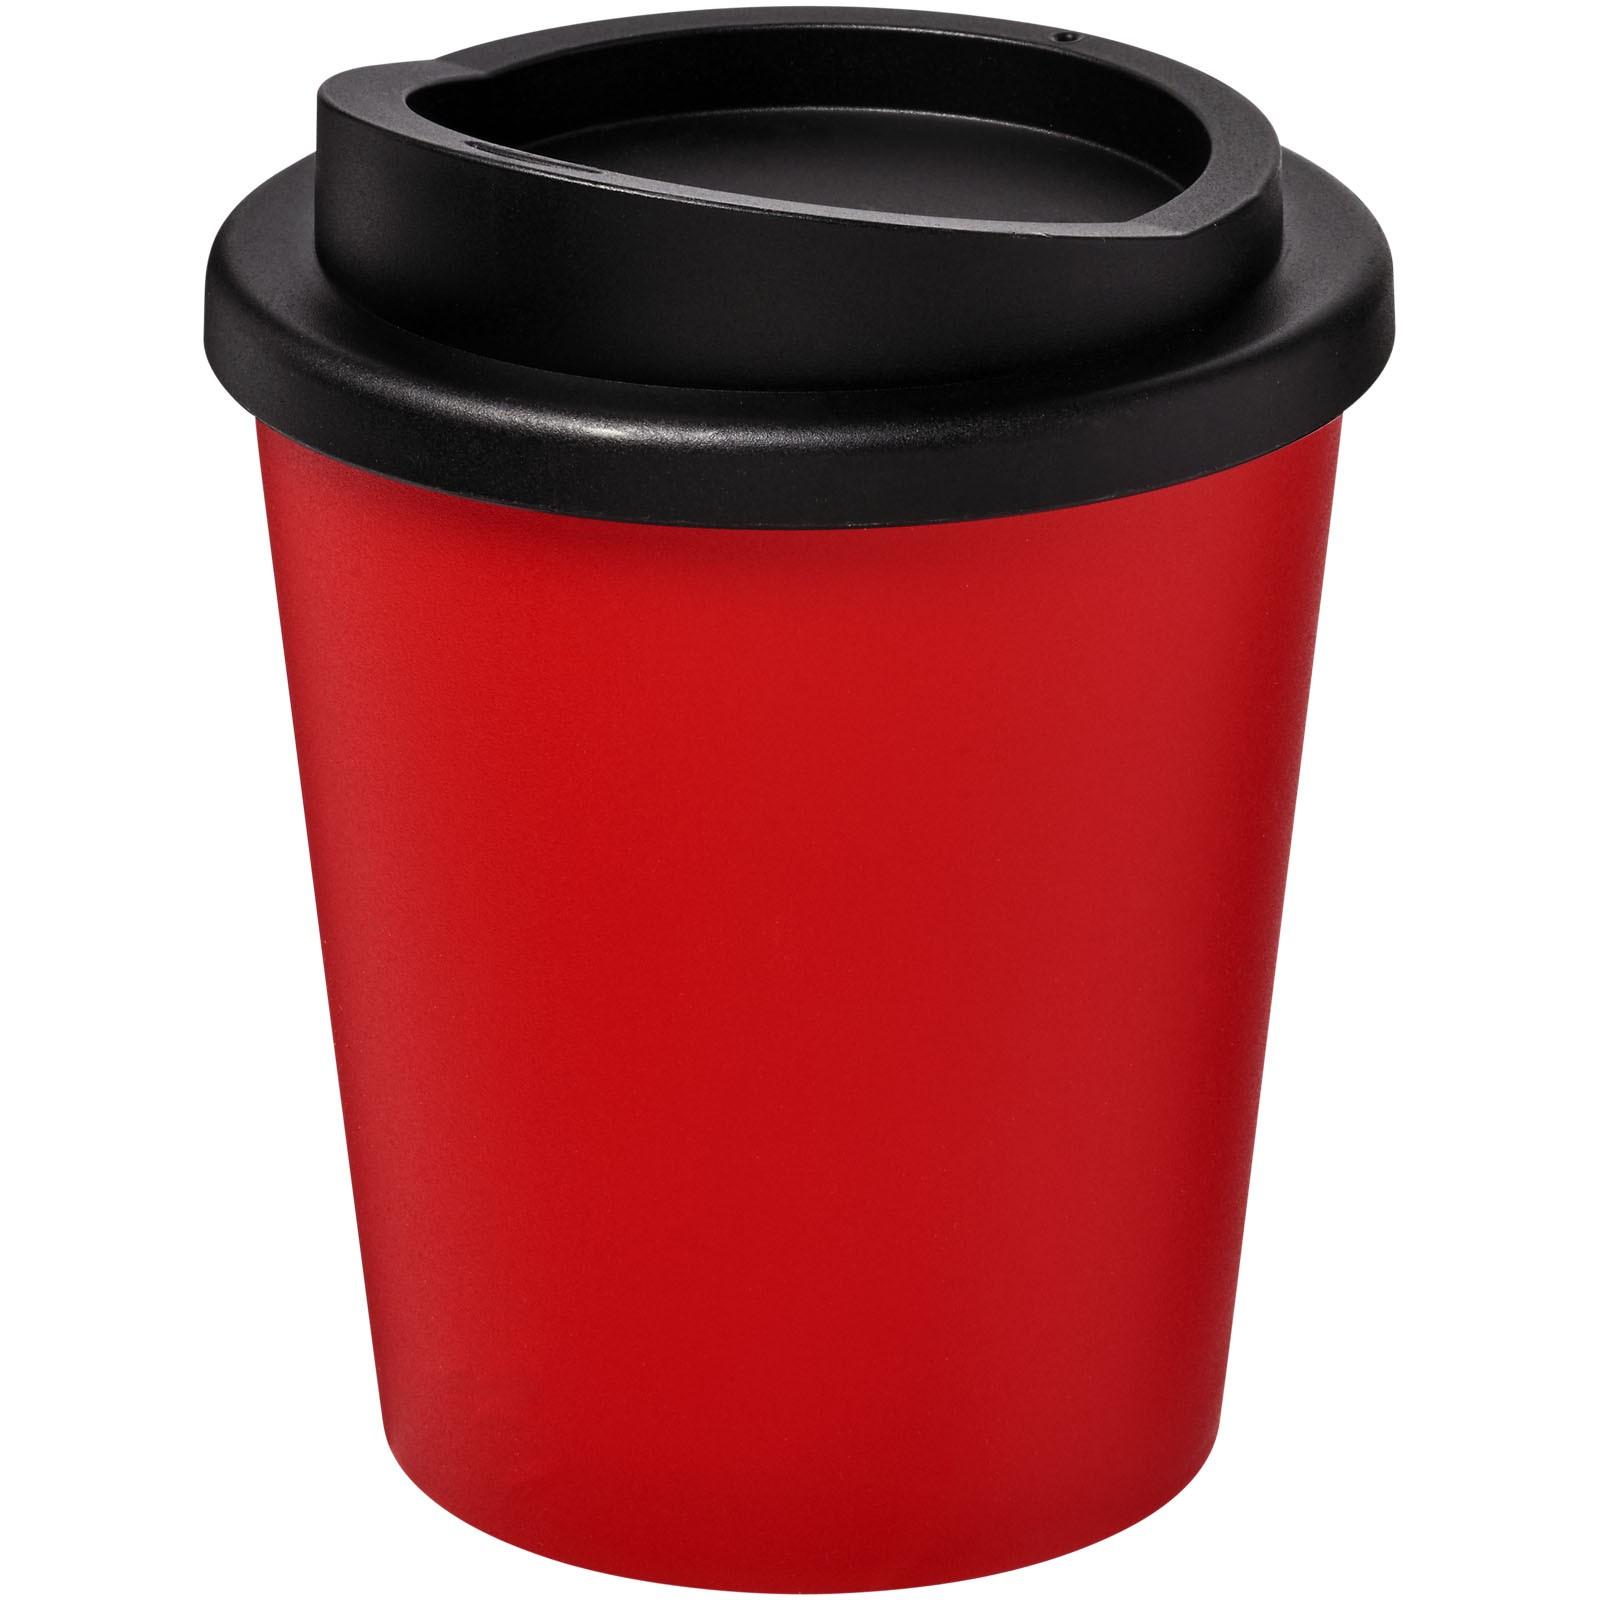 Americano® Vaso térmico Espresso de 250 ml - Rojo / Negro intenso